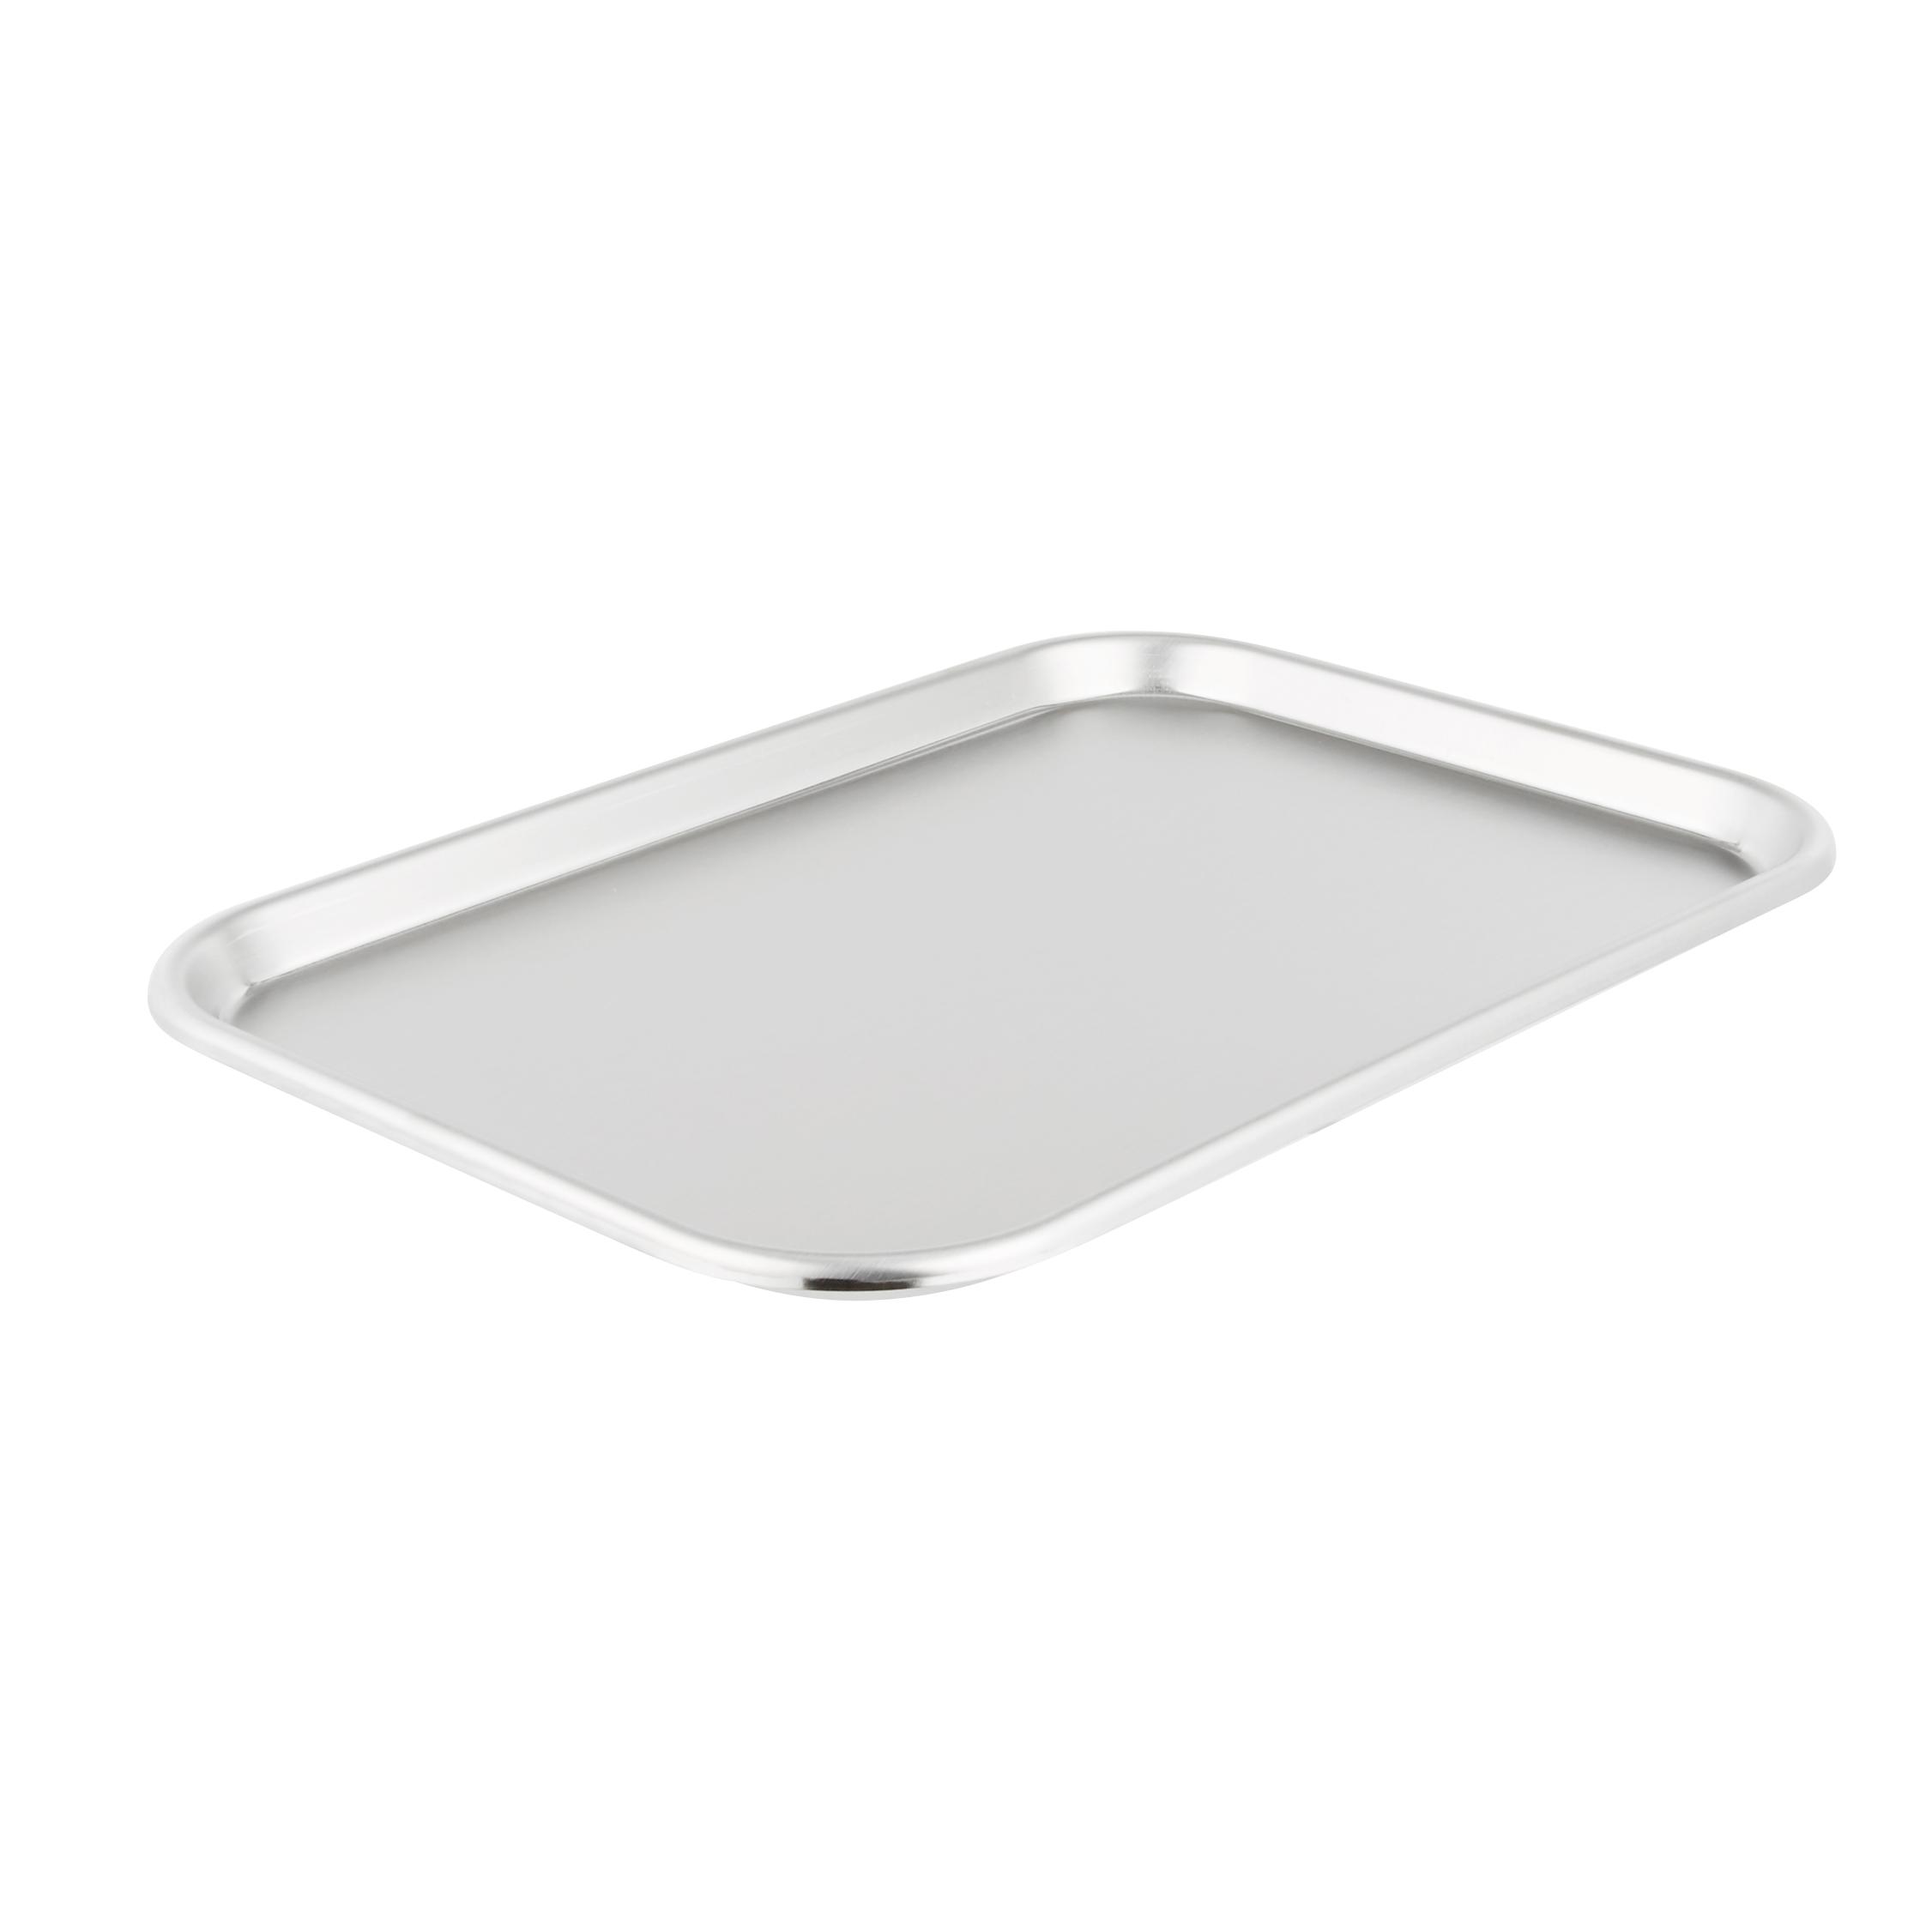 Vollrath 80170 serving & display tray, metal